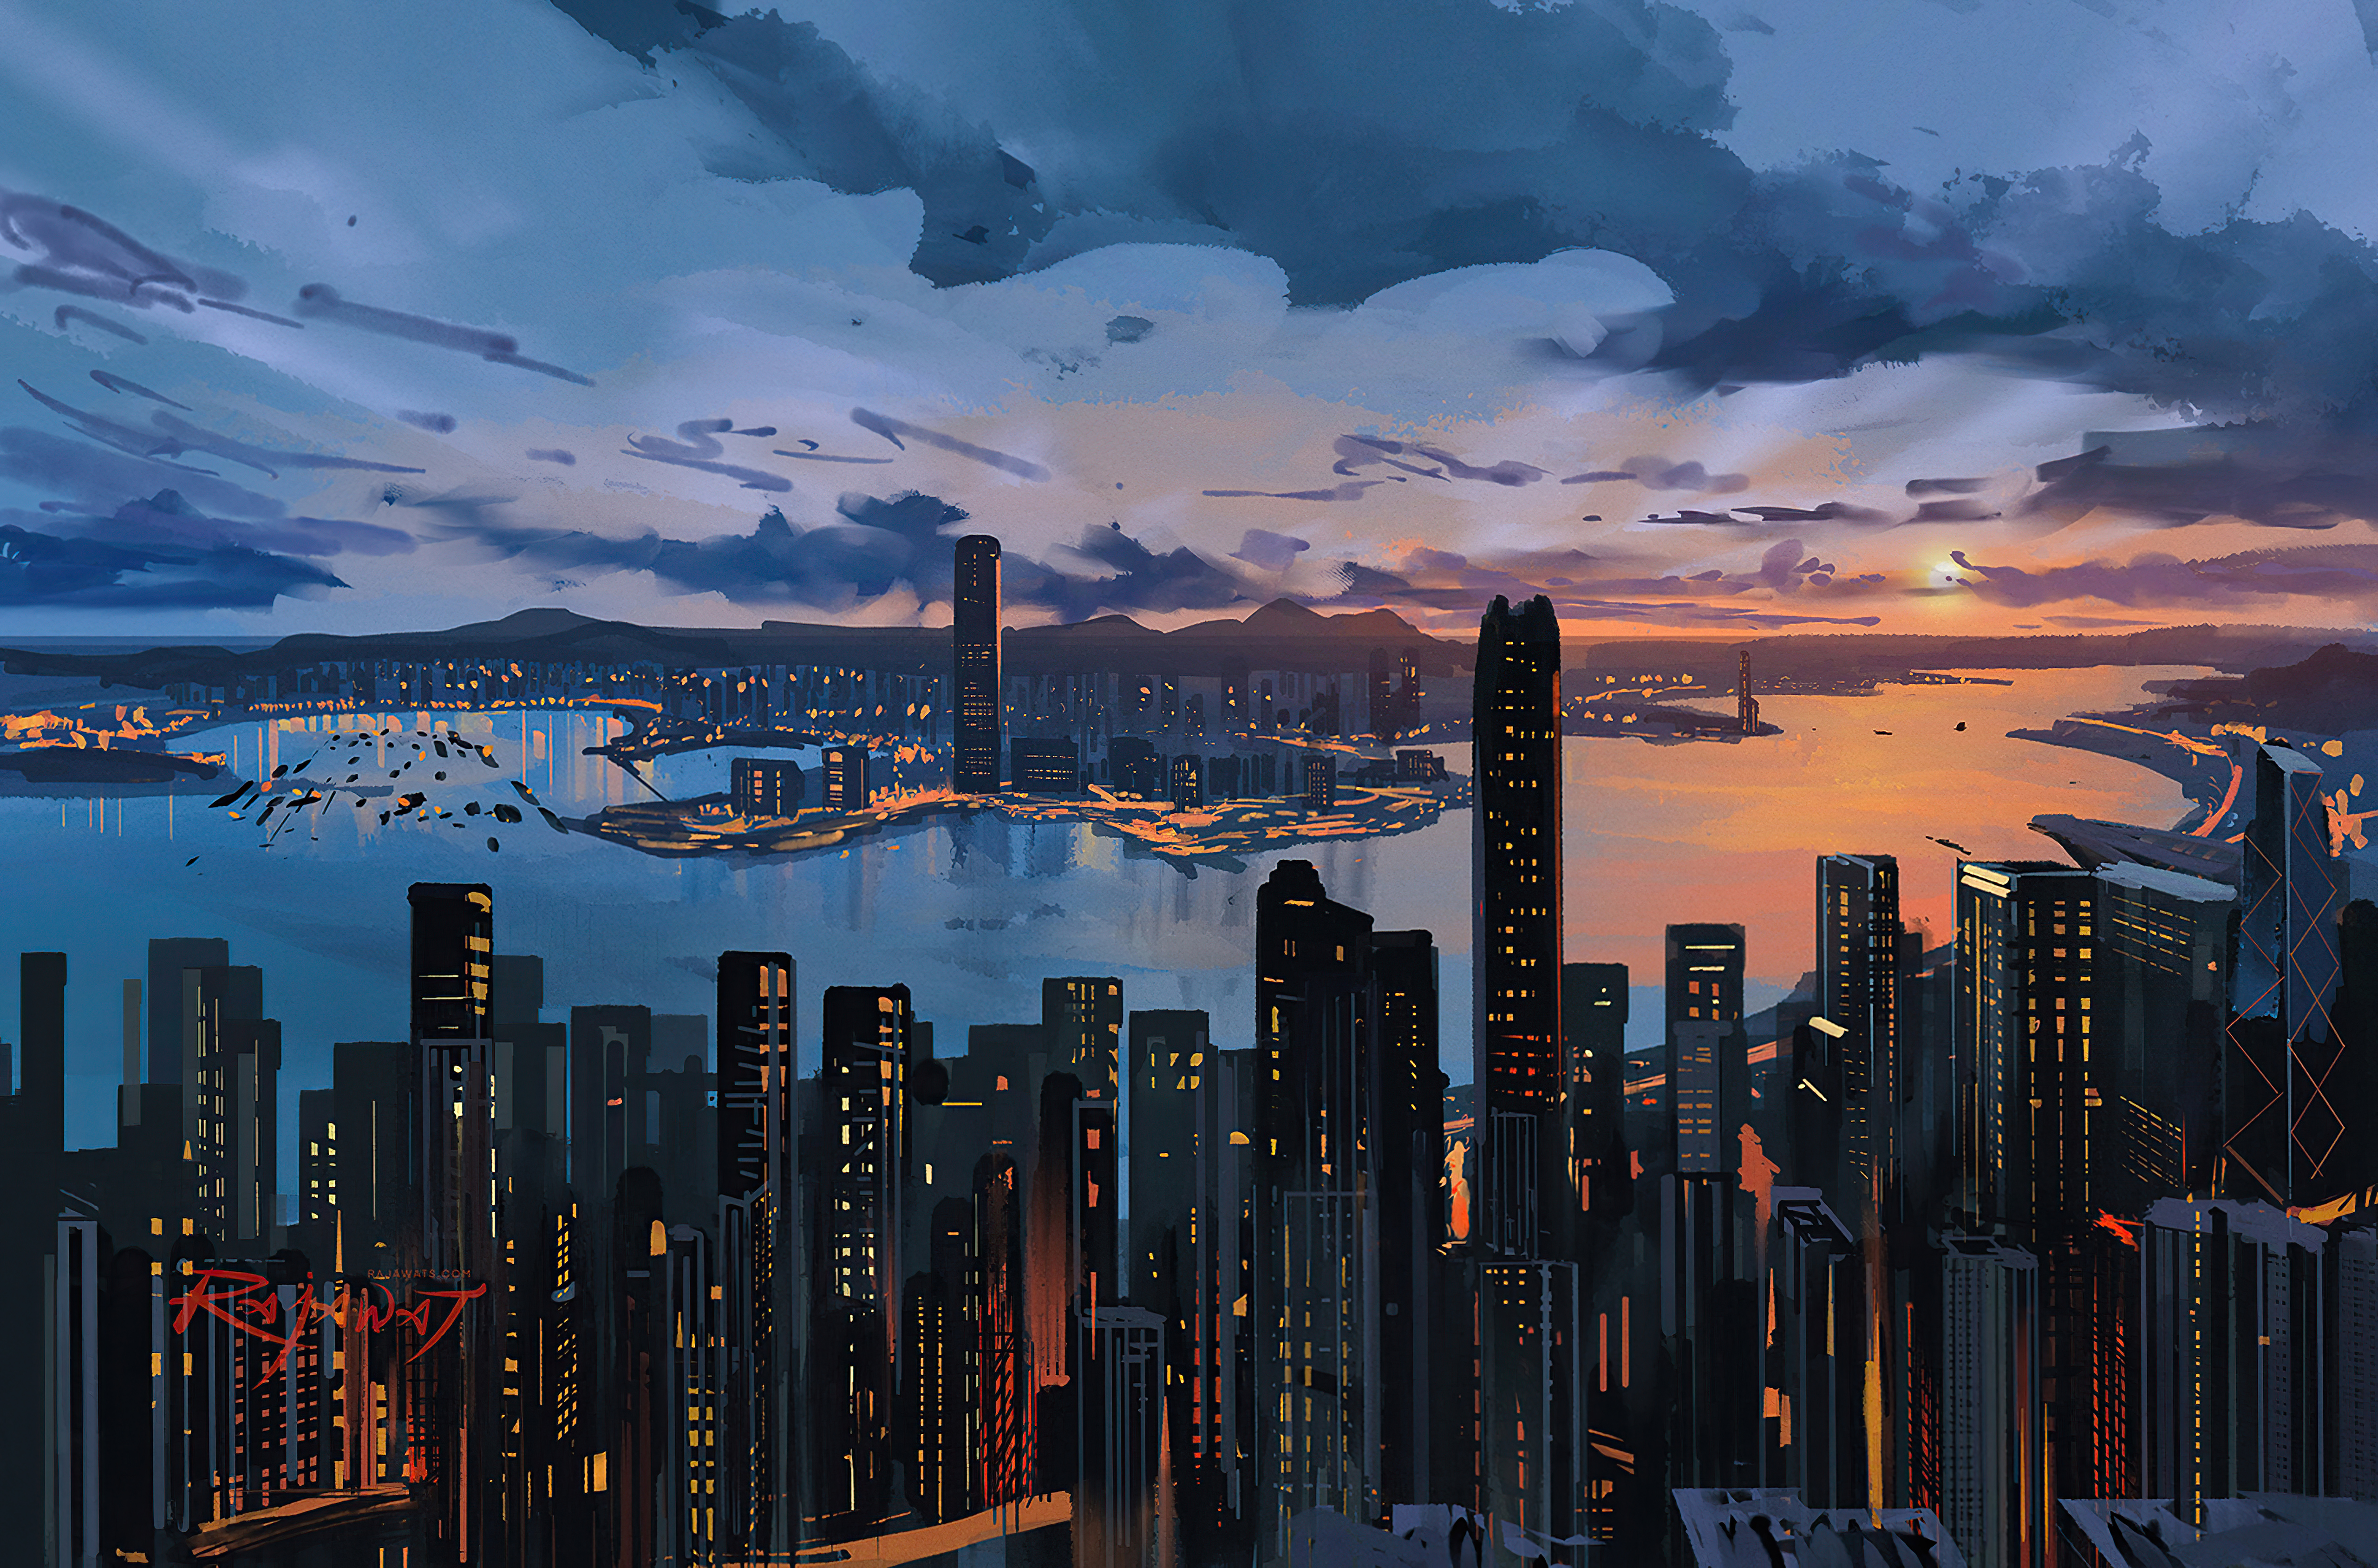 Fondos de pantalla Hong Kong Ciudad Arte Digital